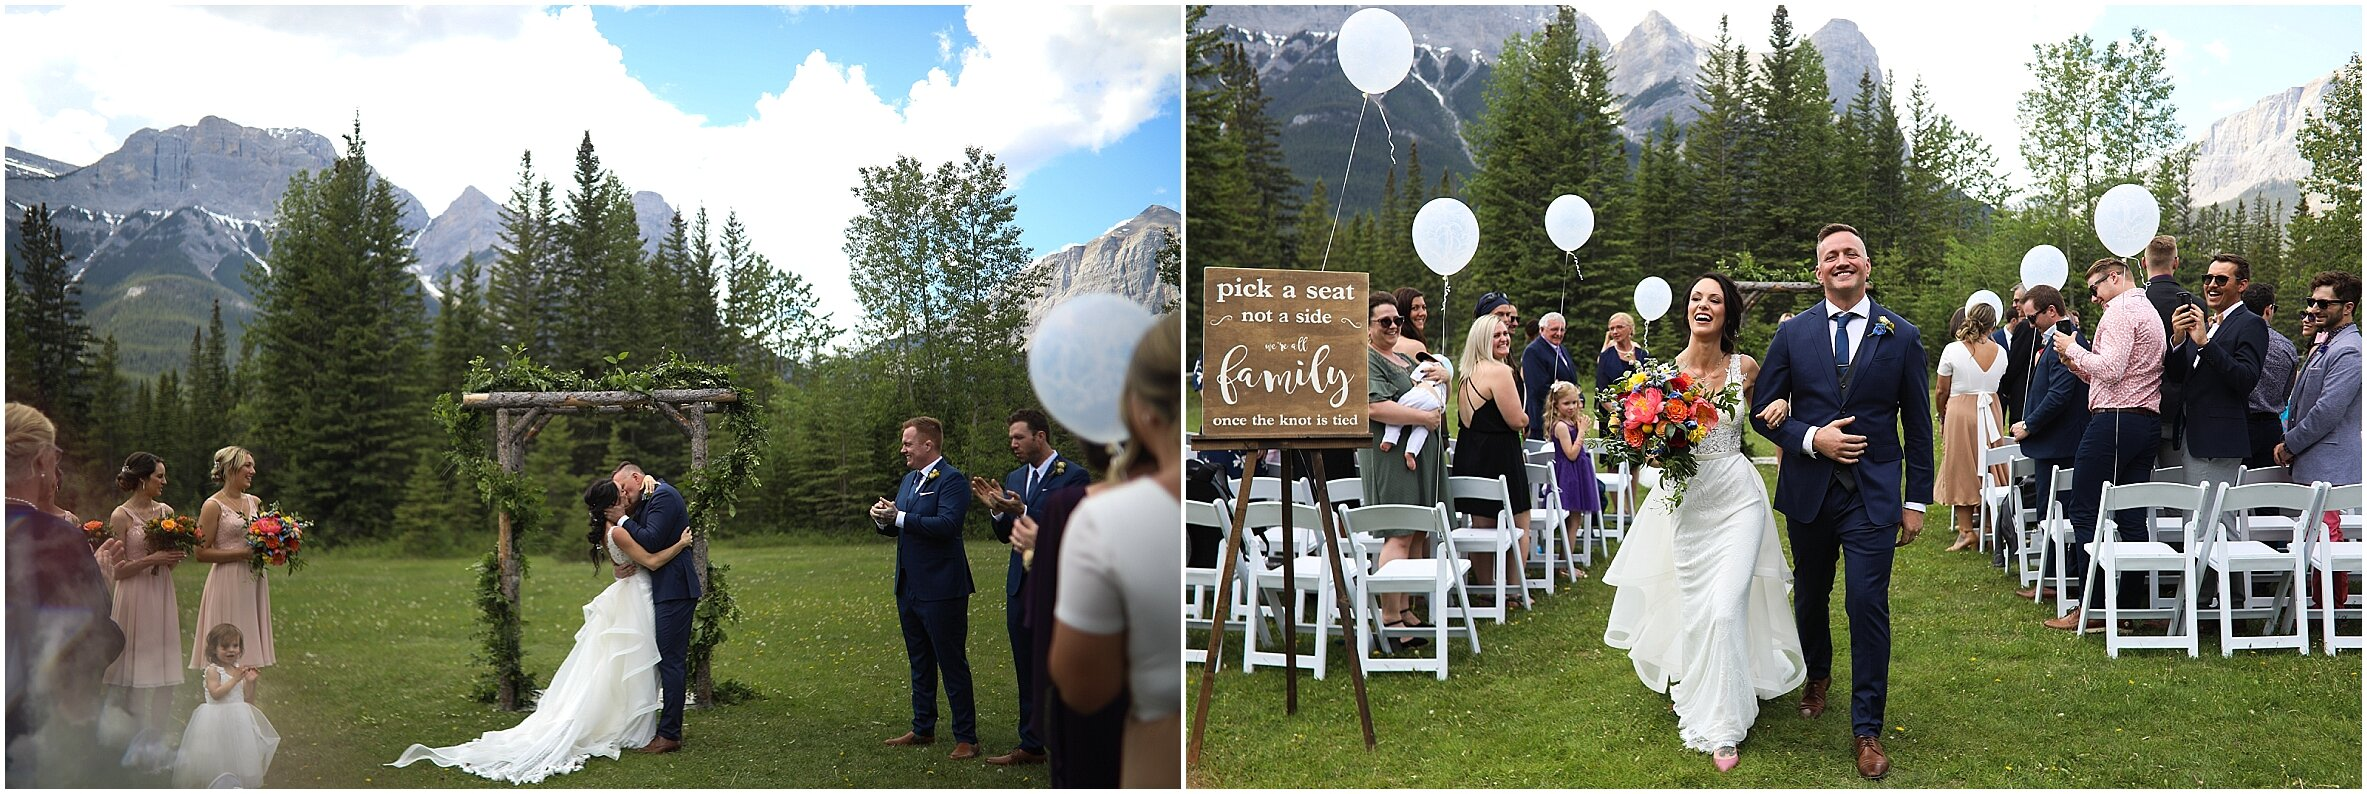 Canmore-Cornerstone-wedding-photography (19).jpg